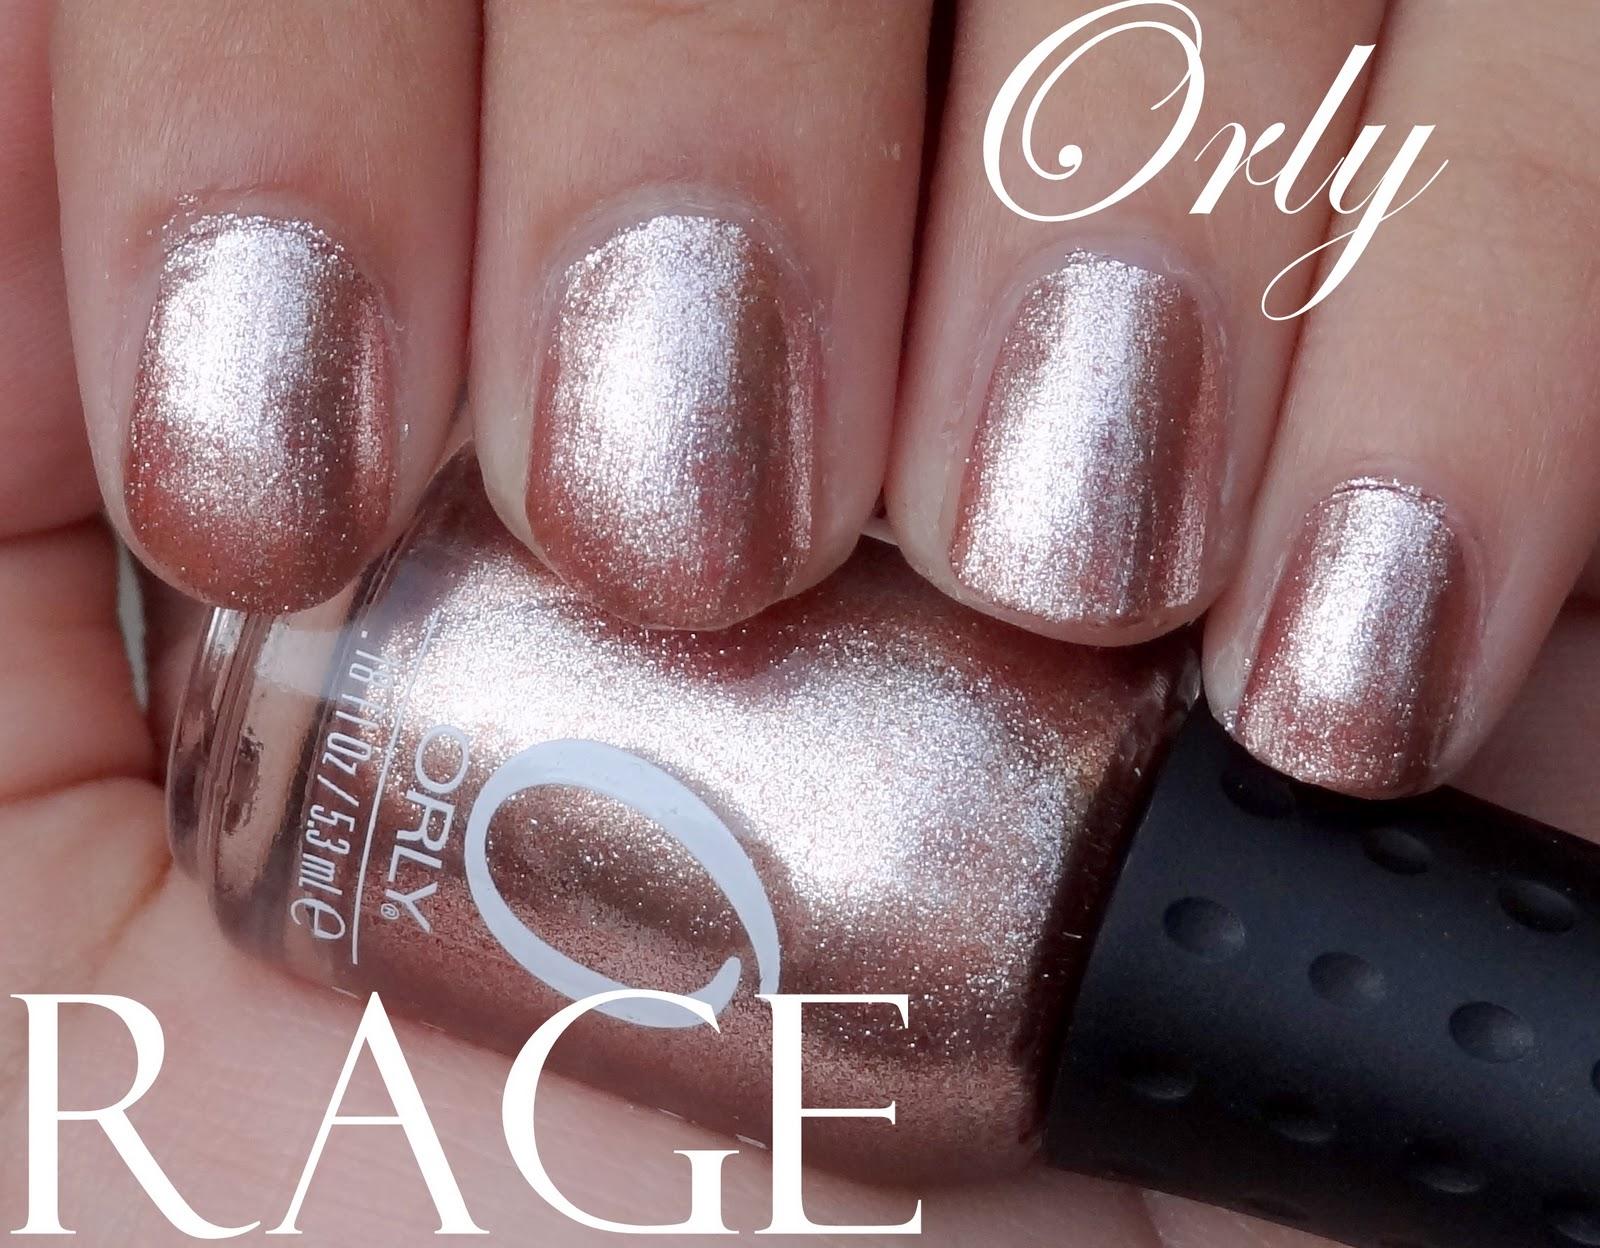 Orly Rage Nail Polish: Swatch, Review, Photos - Peachesandblush